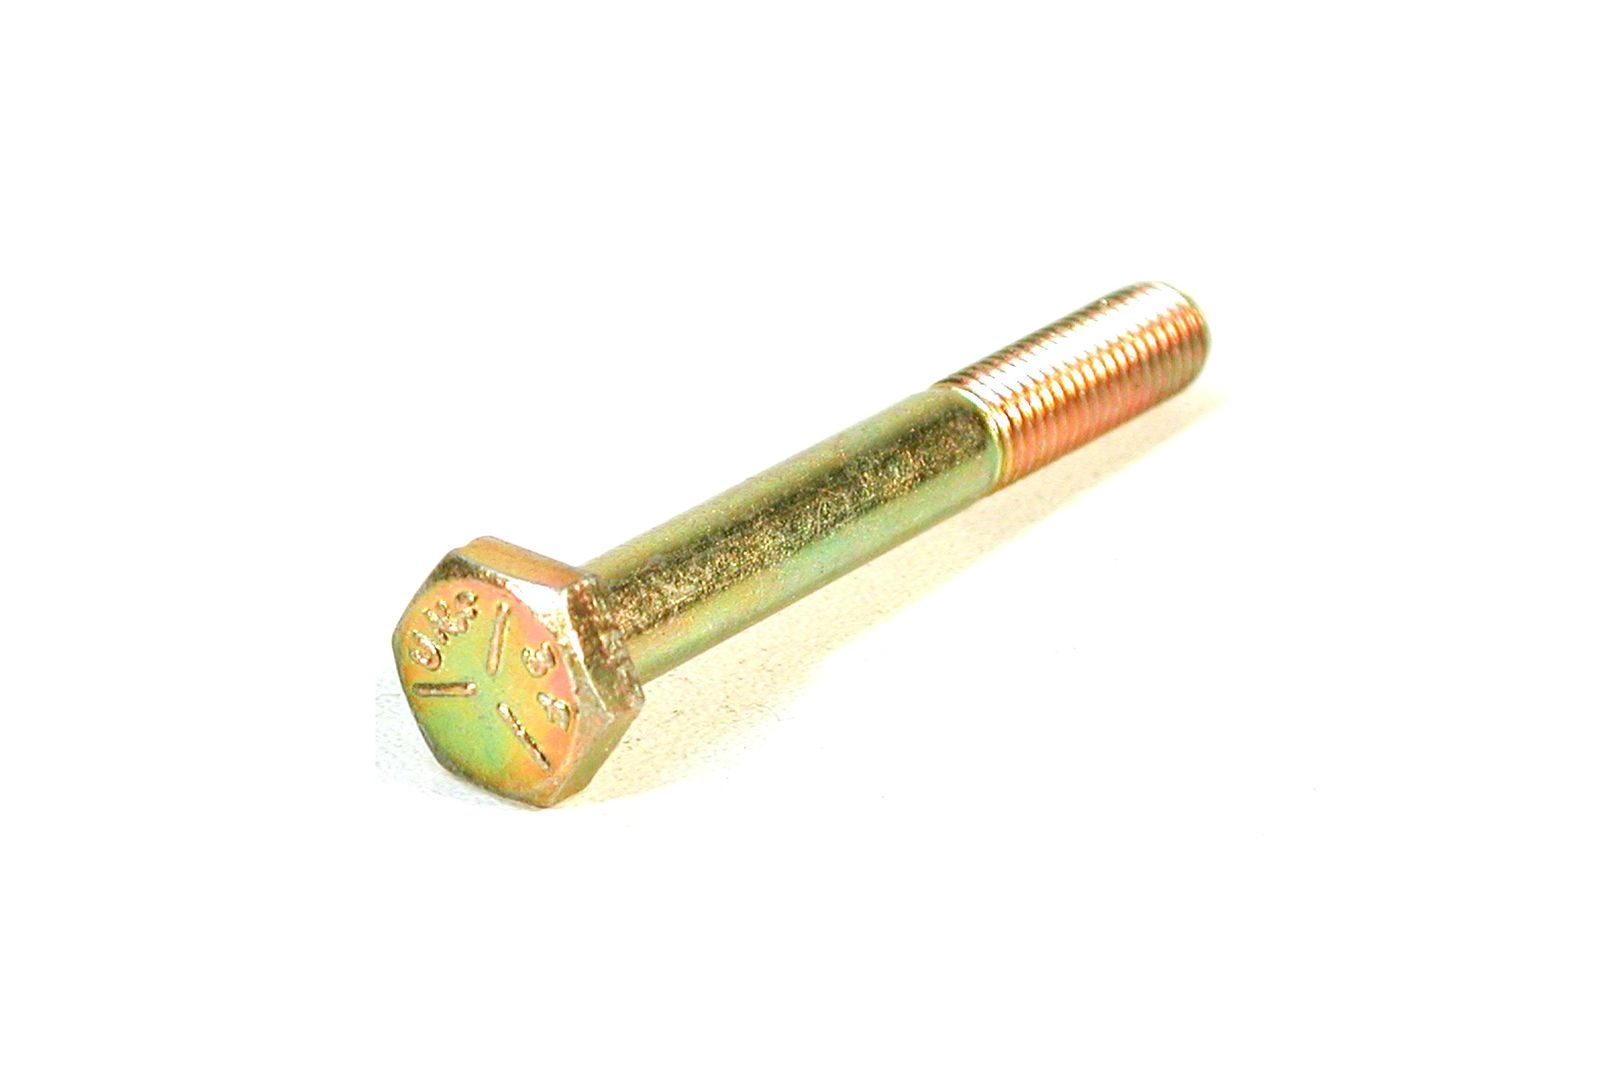 "#1002-08 Bolzen UNF 1/4"" x 2"" (5x), BH604161|5"